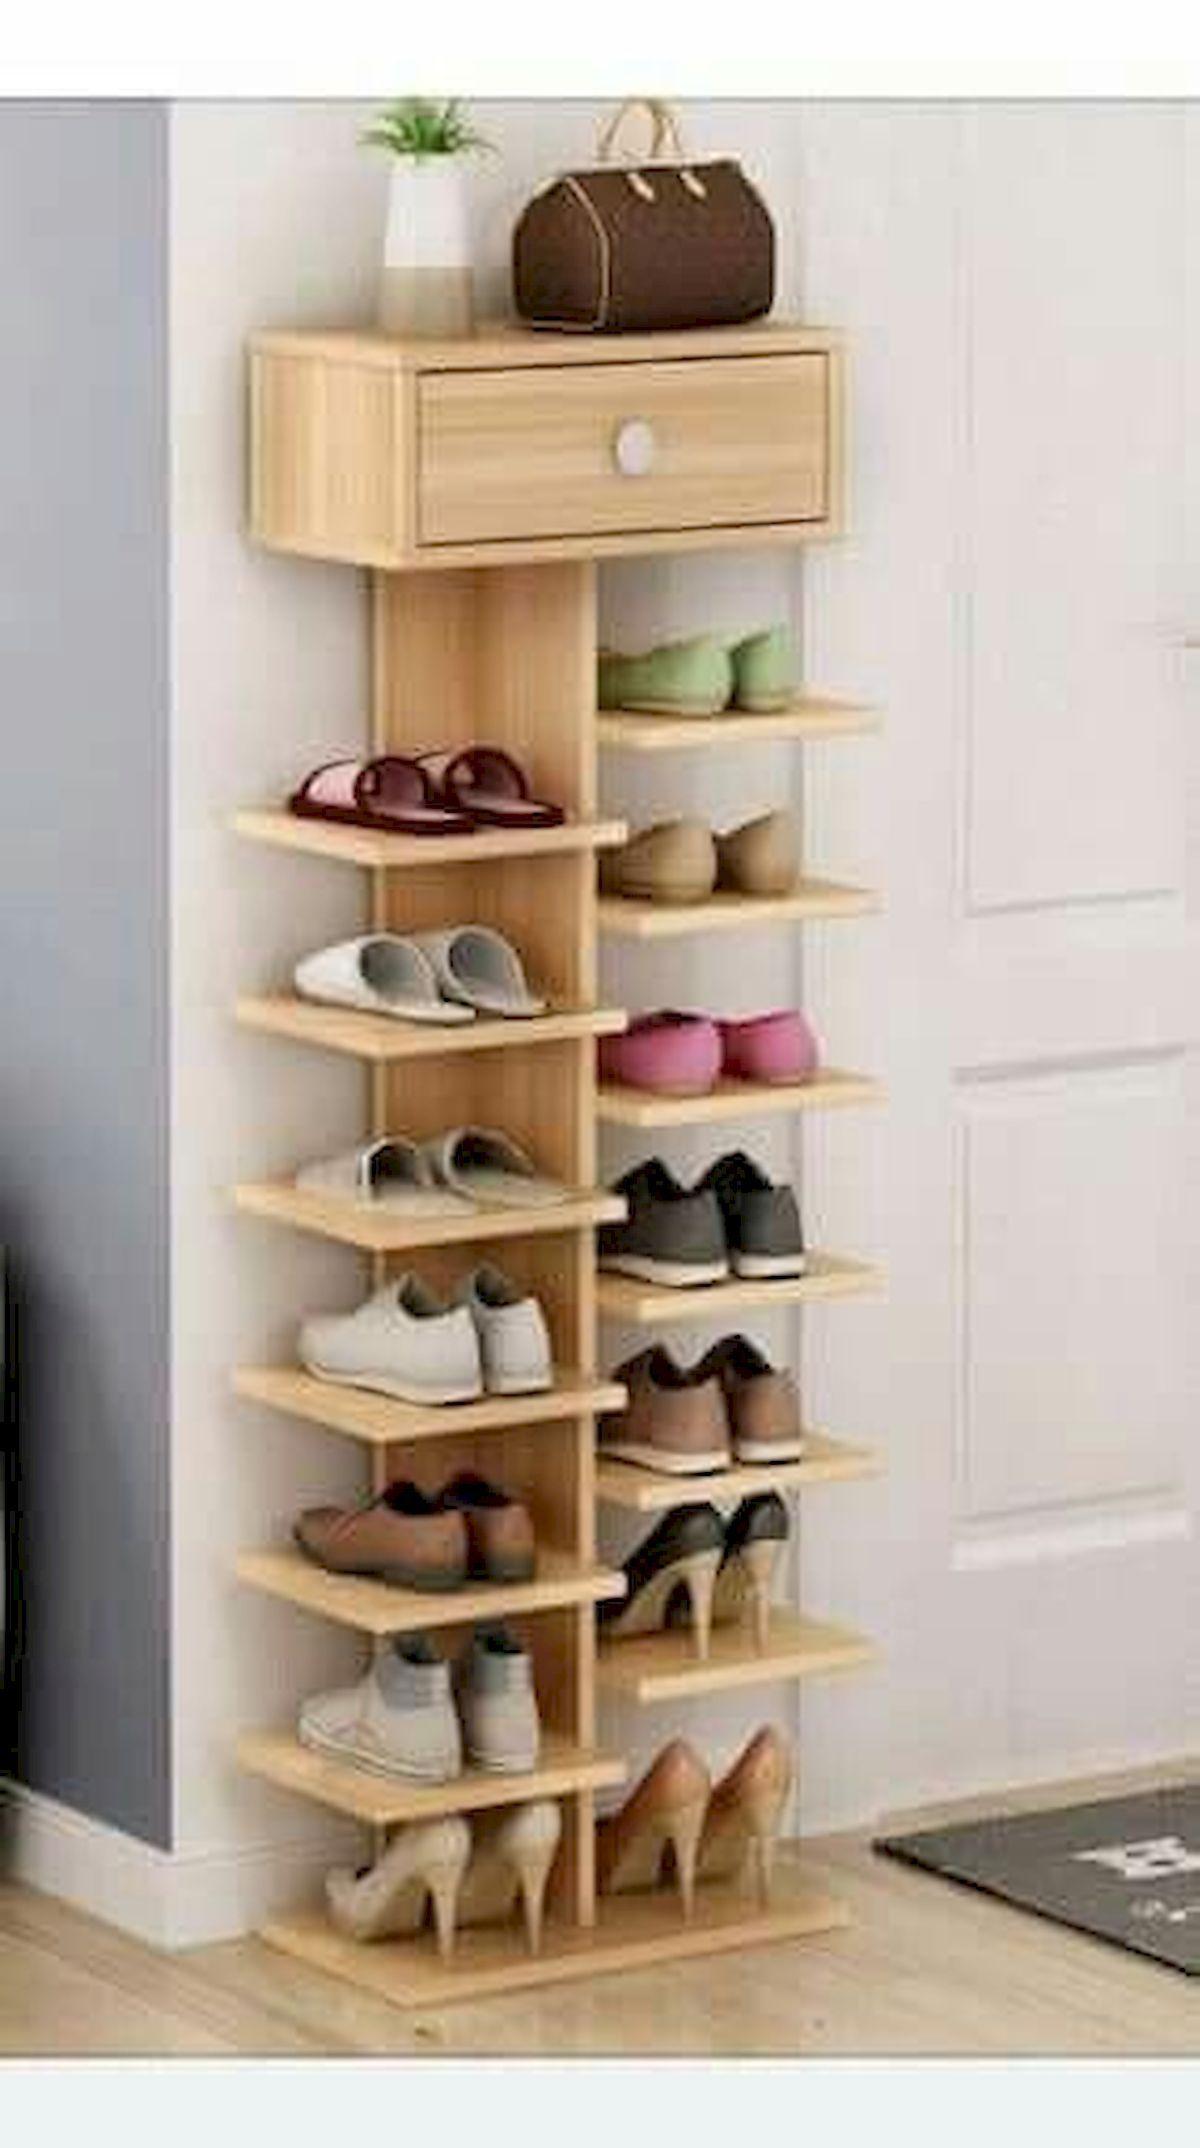 60 Fantastic DIY Projects Wood Furniture Ideas Prachtigs opbergmeubeltje